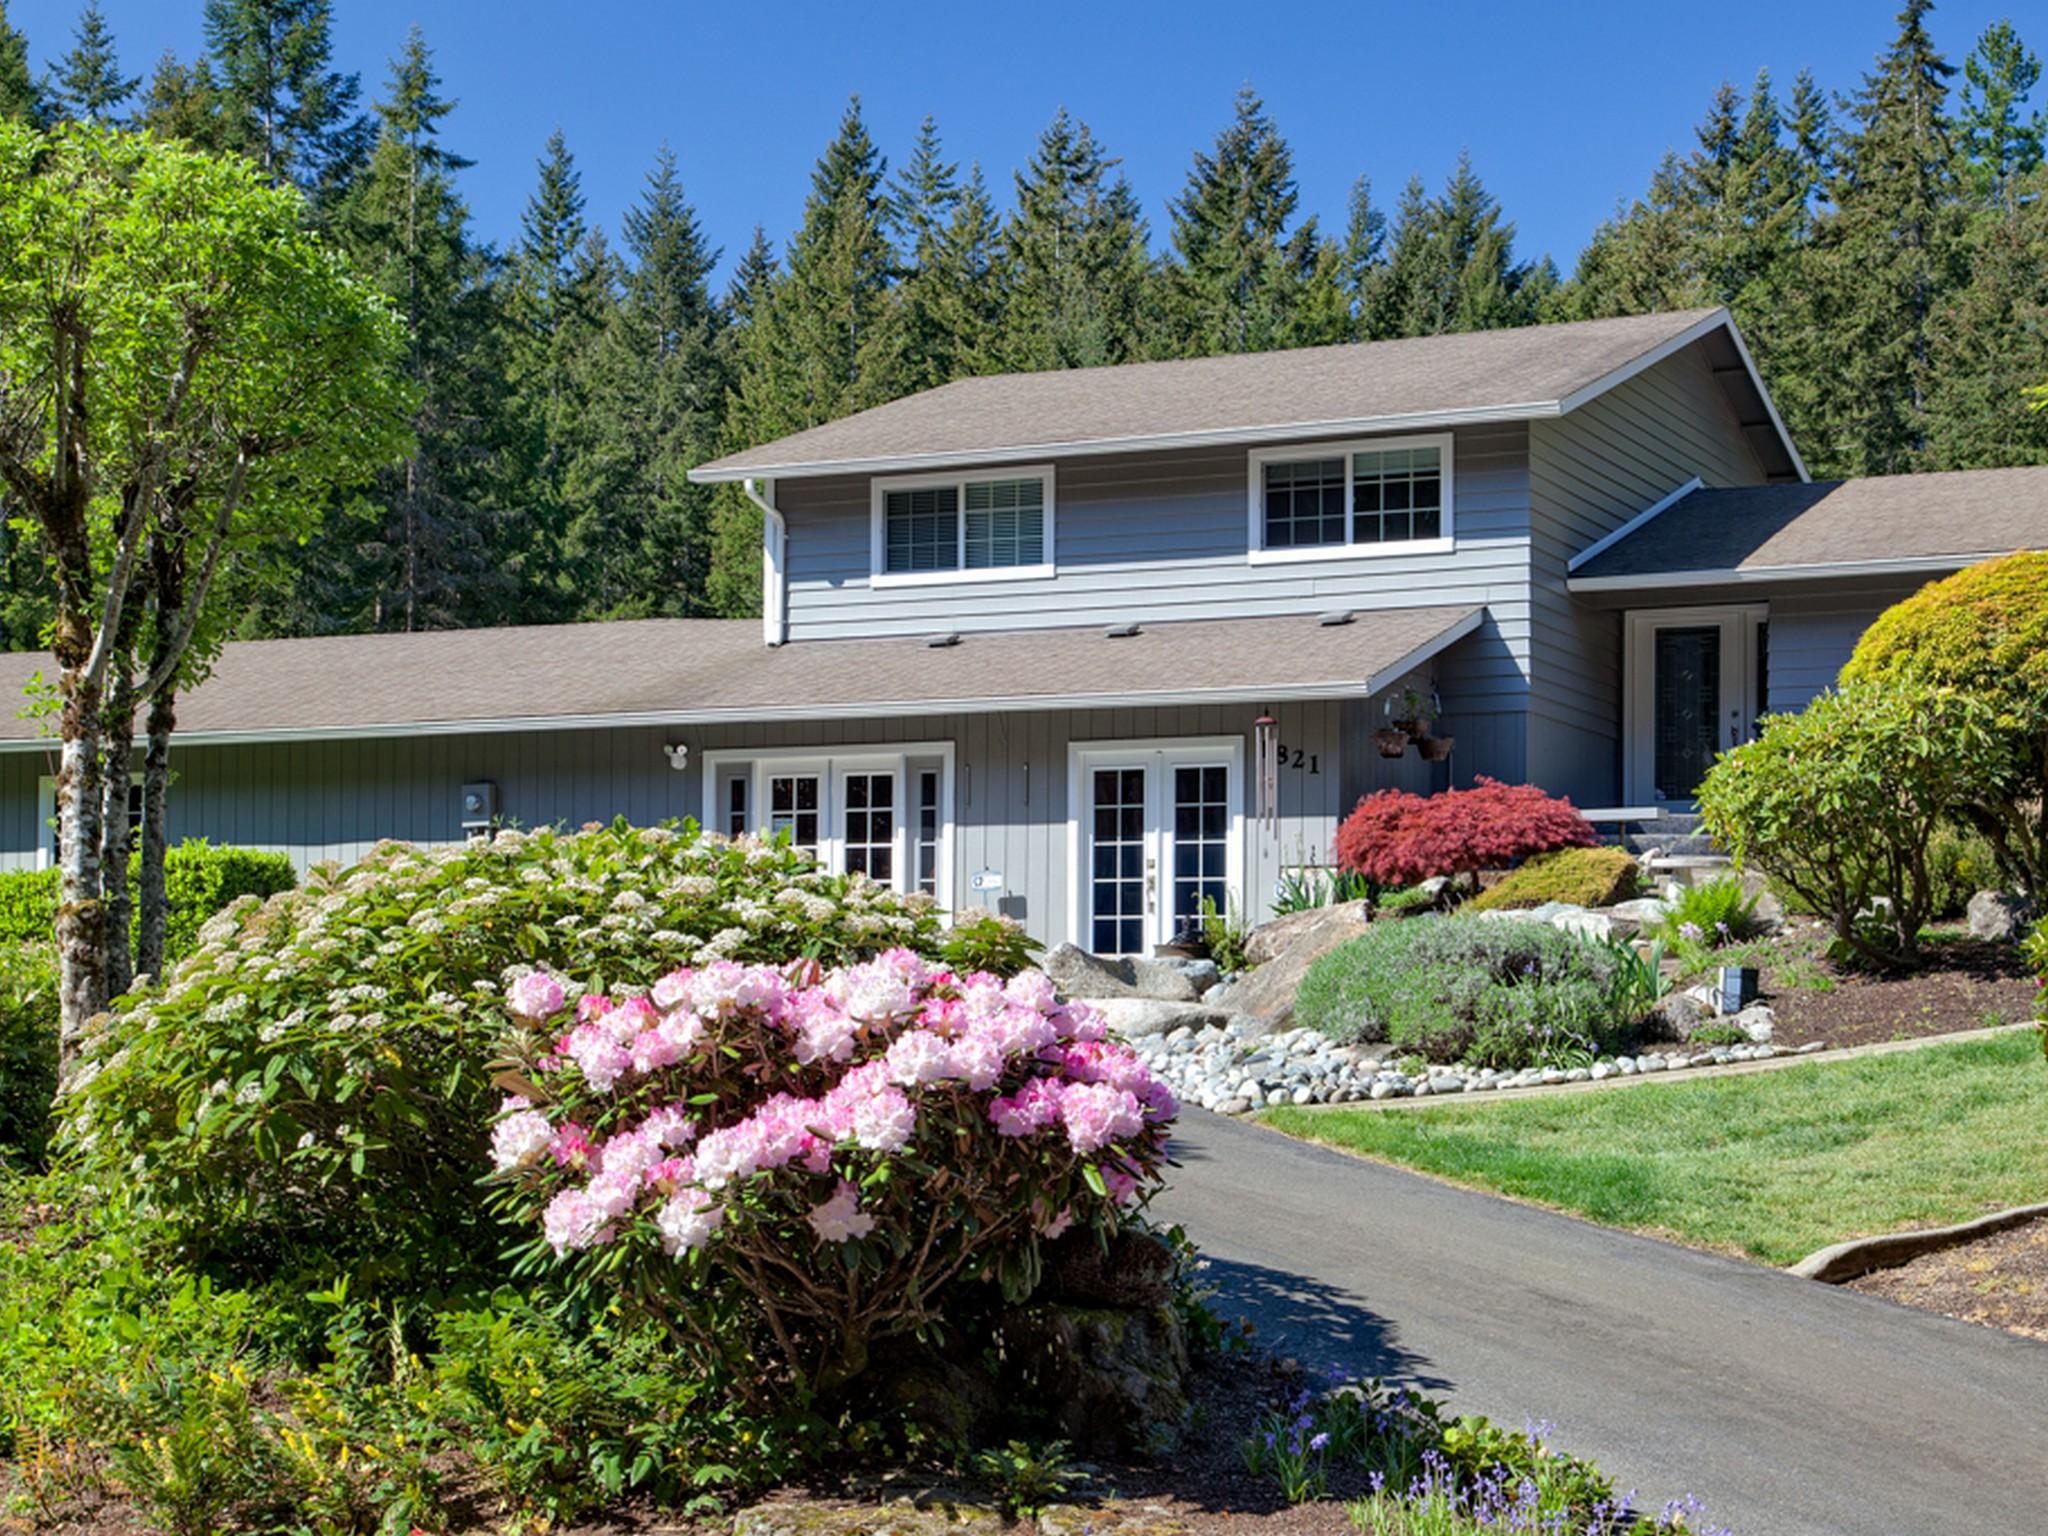 Casa Unifamiliar por un Venta en Fabulous Remodeled Poulsbo Home 1826 NW Ponderosa Place Poulsbo, Washington, 98370 Estados Unidos